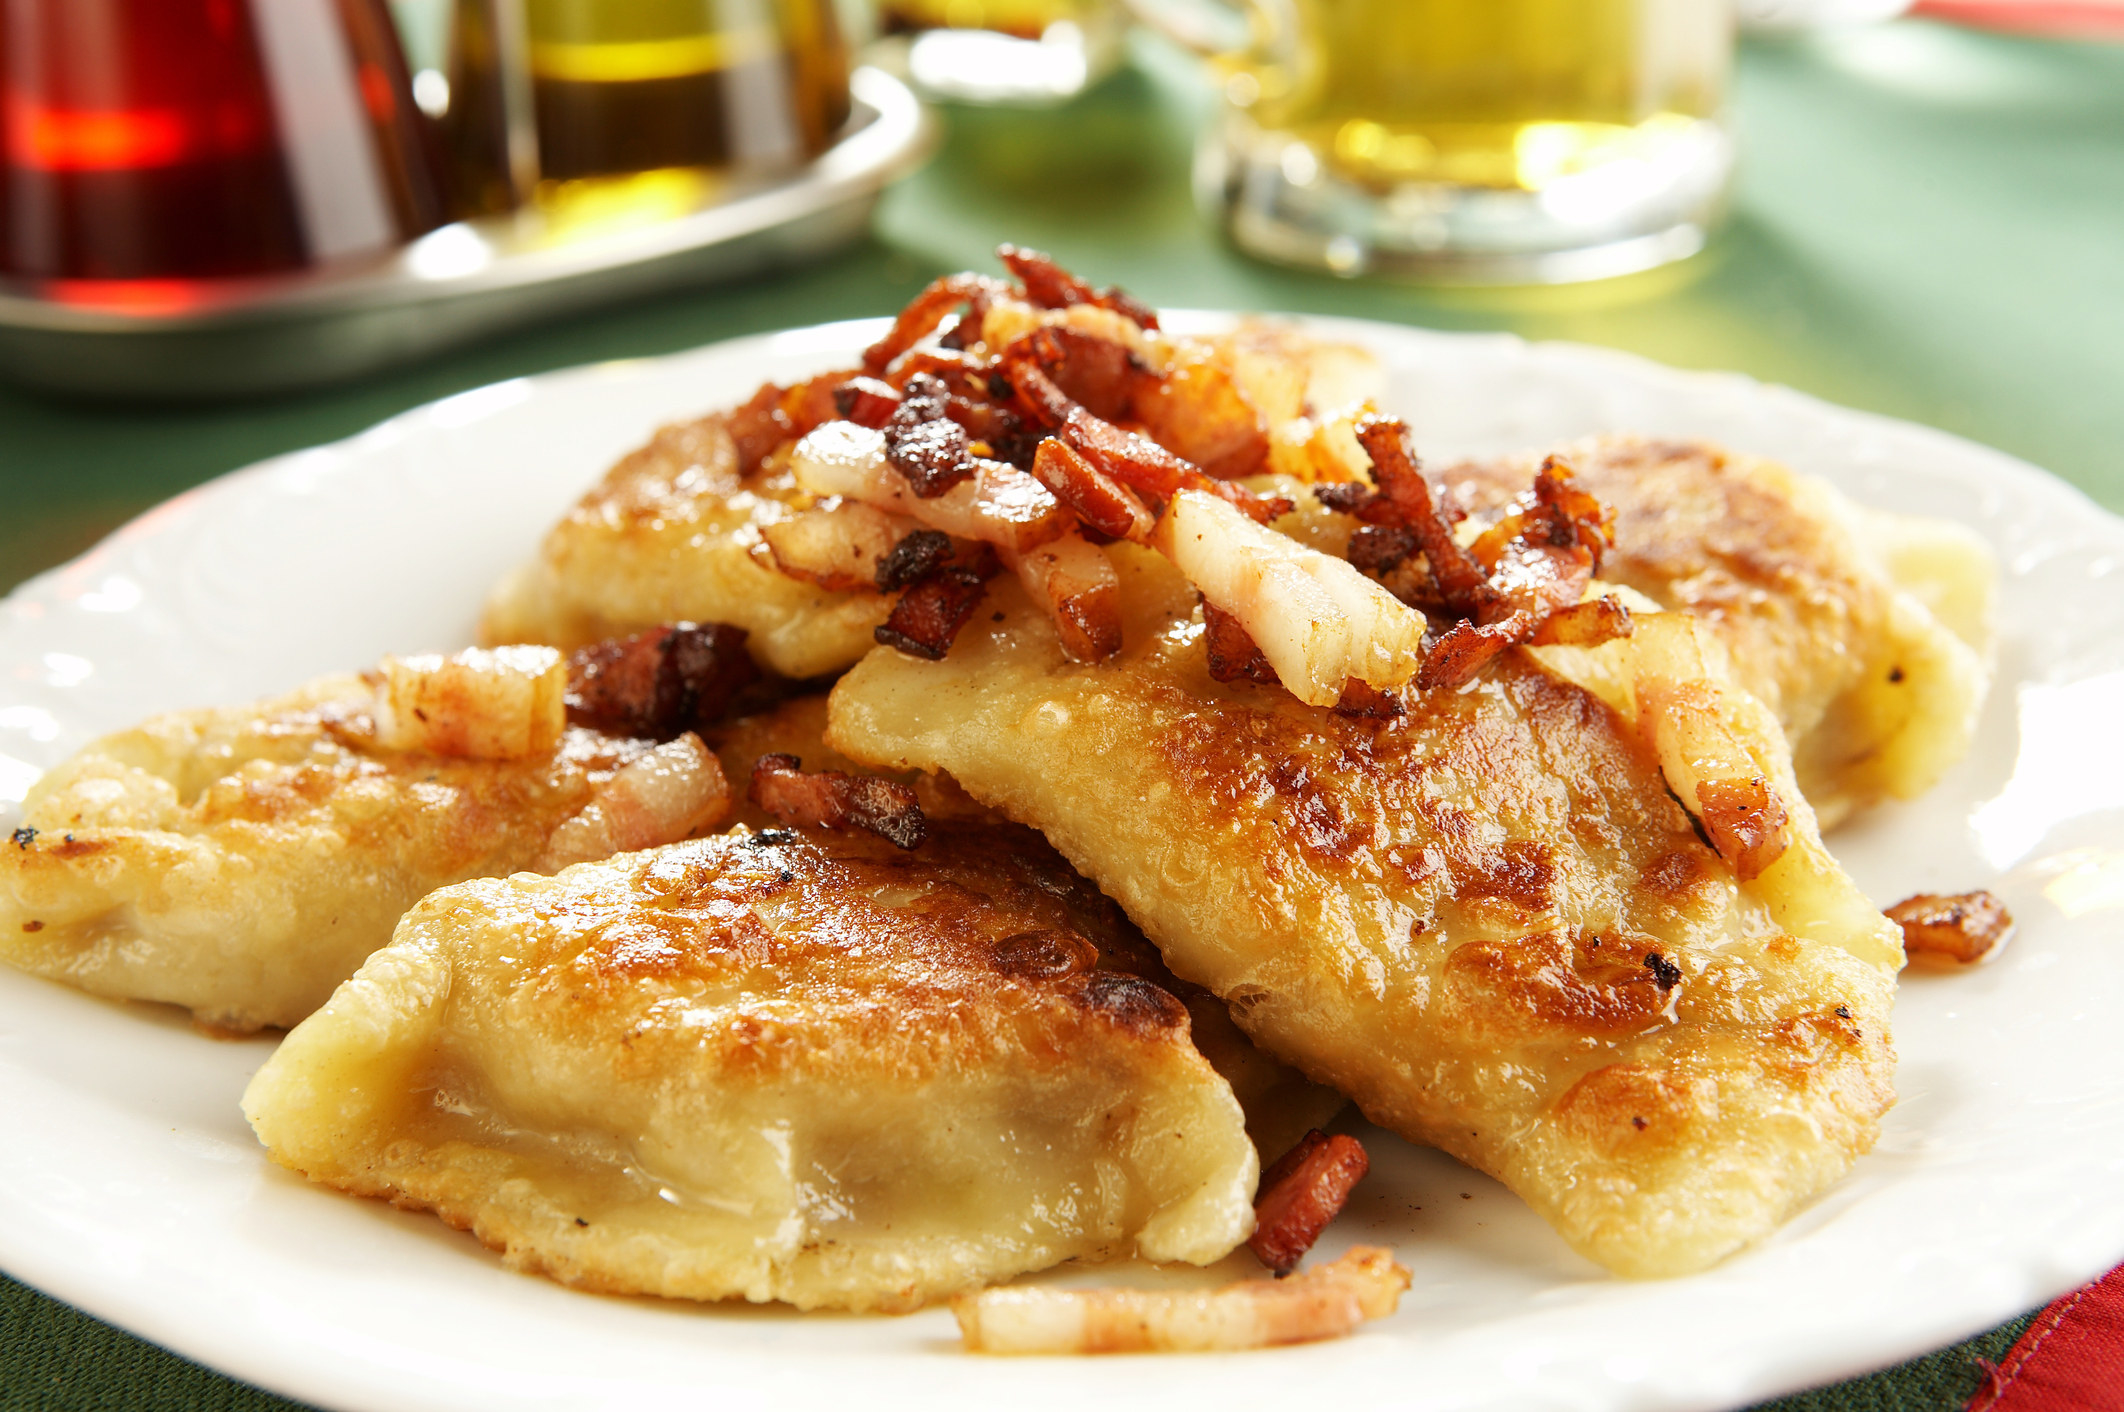 Fried Polish vareniki (aka pierogis).